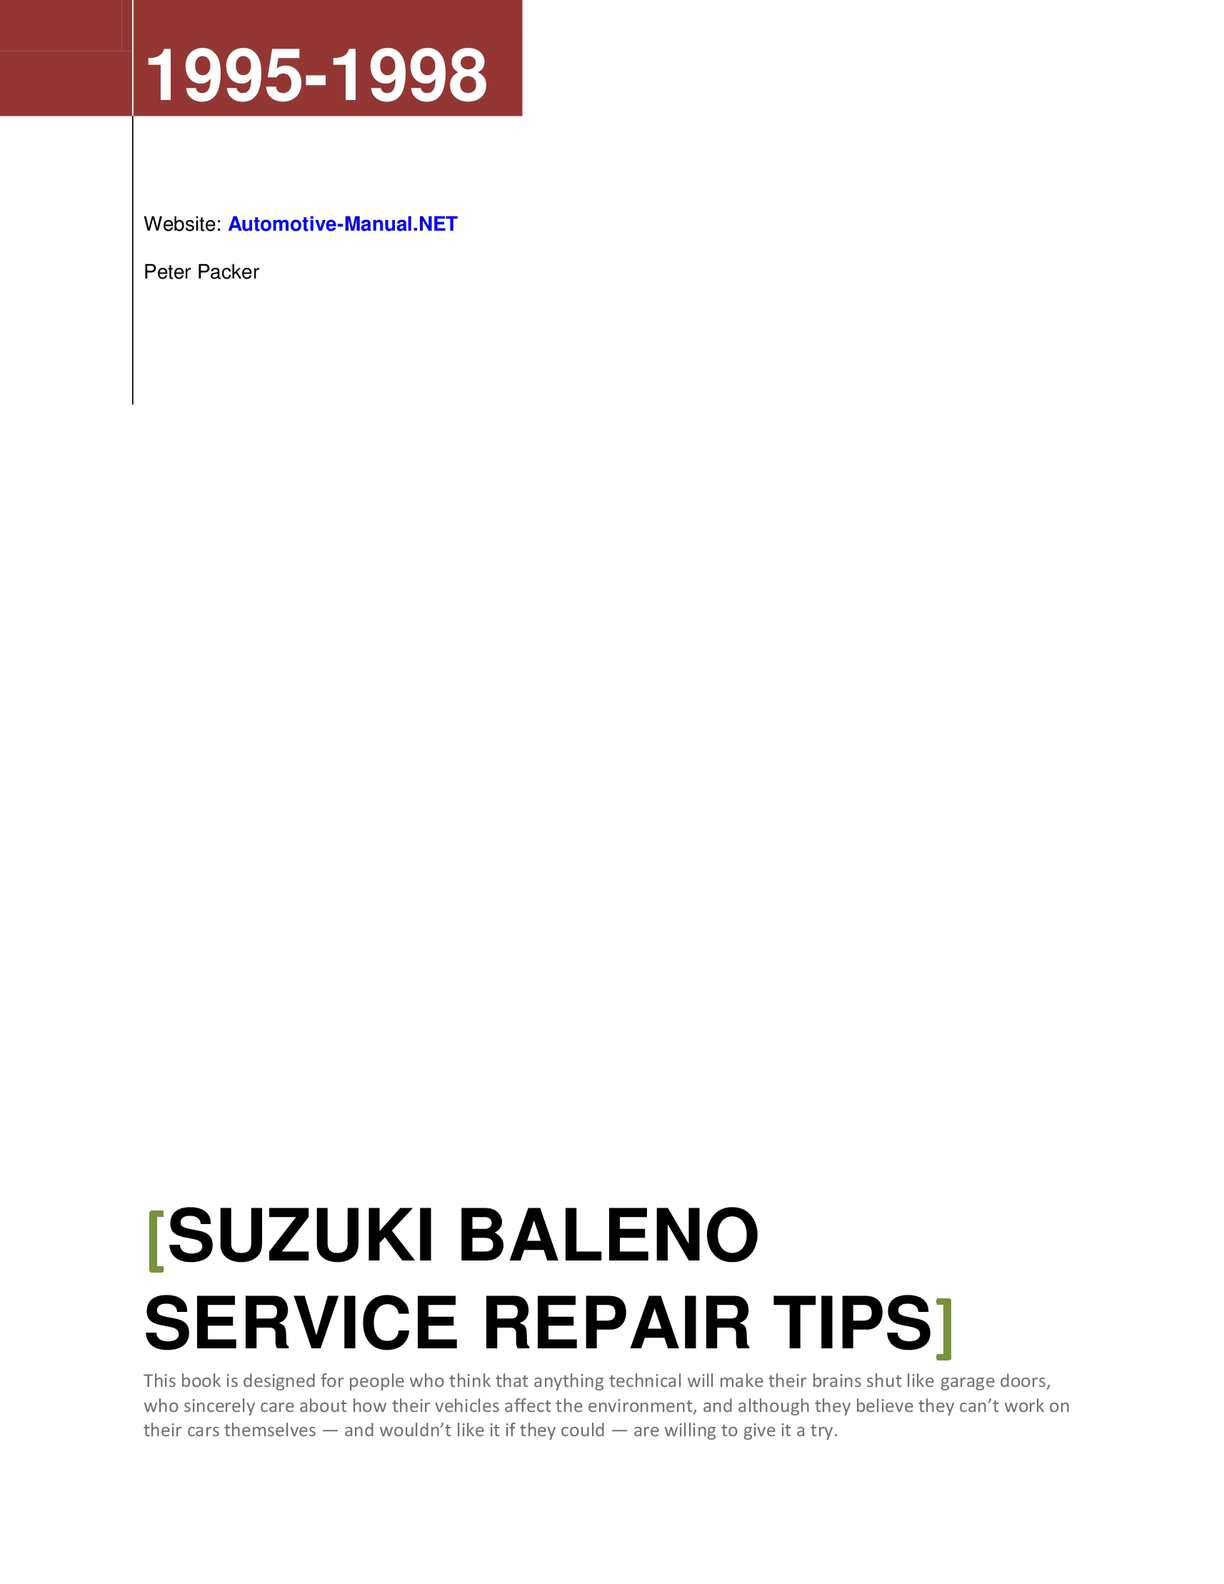 Bestseller Suzuki Baleno Manual Wiring